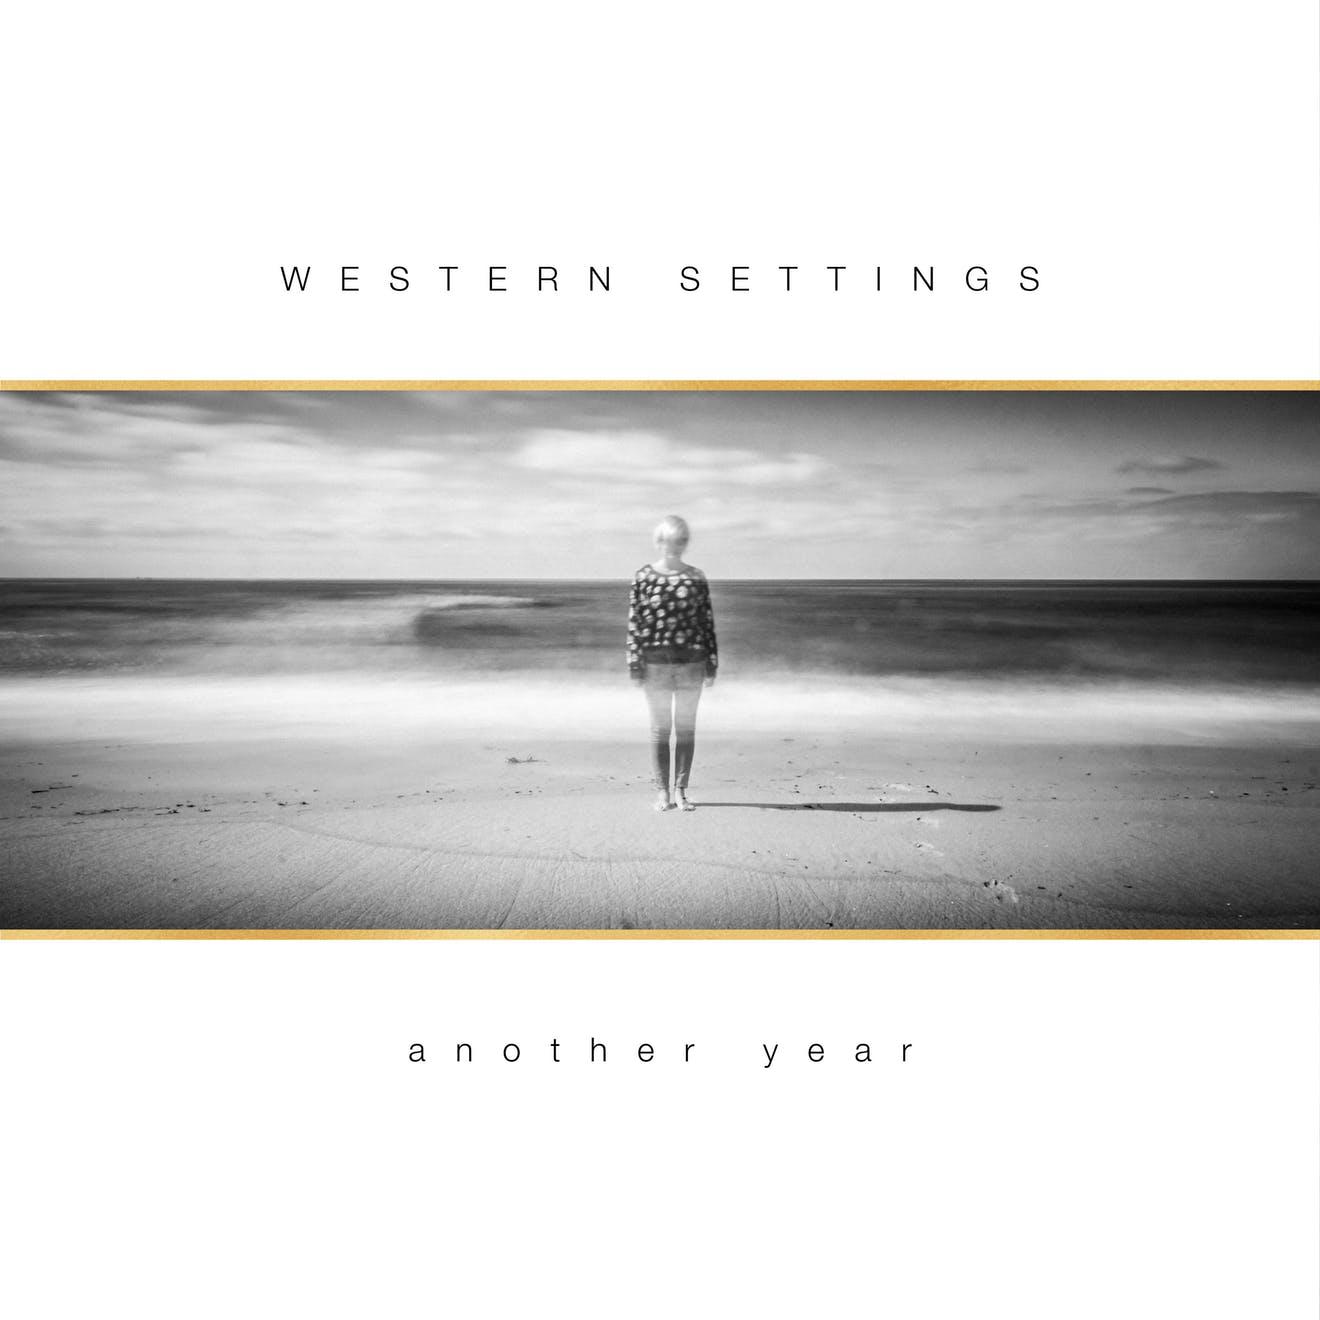 Western-Settings-Another-Year-artwork.jpg